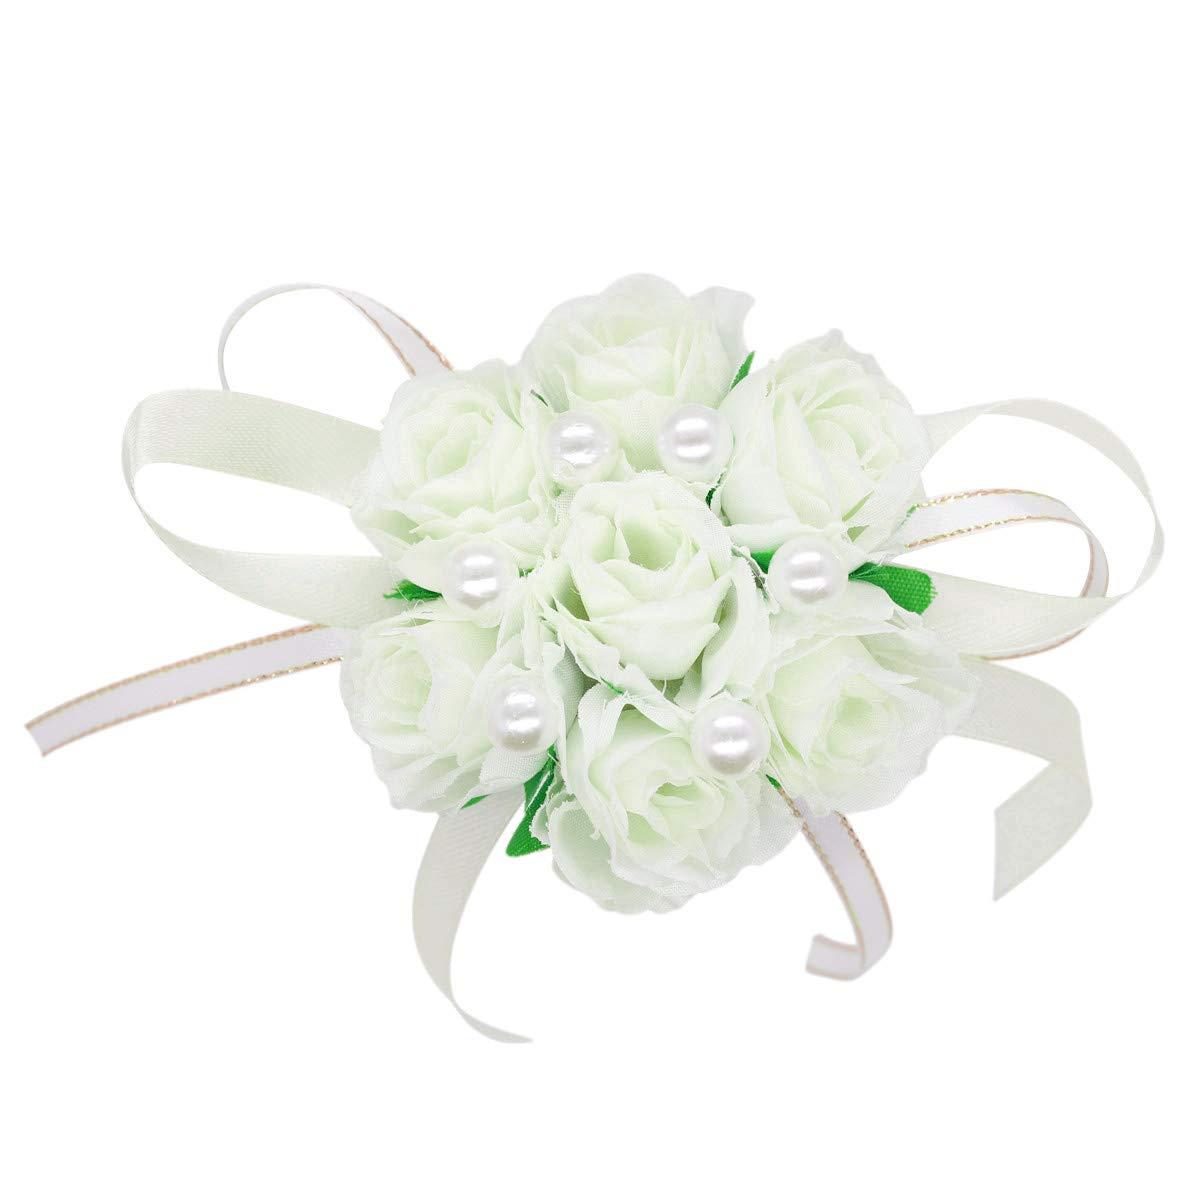 Off White, 2 Hand Flower Wristband Adjustable Ribbon Bride Bridesmaid Wedding Wrist Corsage Hand Decorative Bracelet Wristband Artificial Fabric Rose Wedding Flowers Accessories Prom Festival